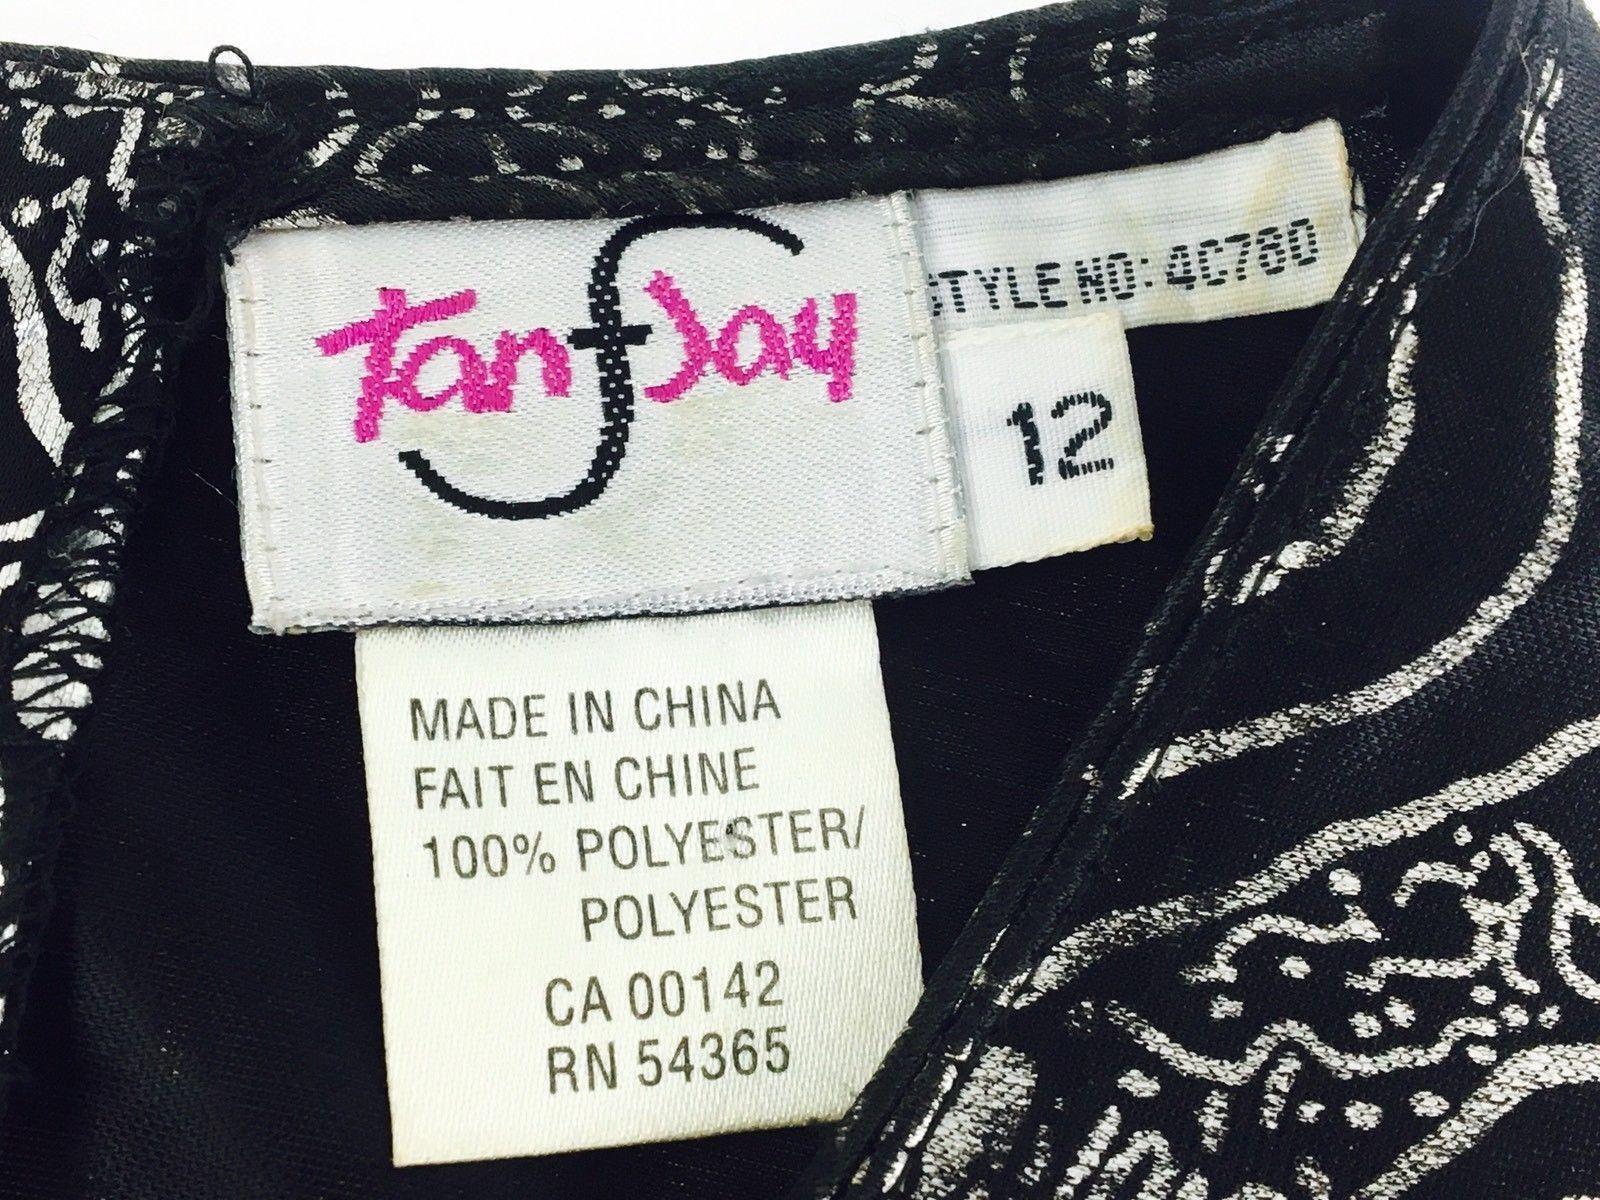 Silver Black Foil Snakeskin Size 12 14 Vintage 90s 00s Cut Out Crop Top